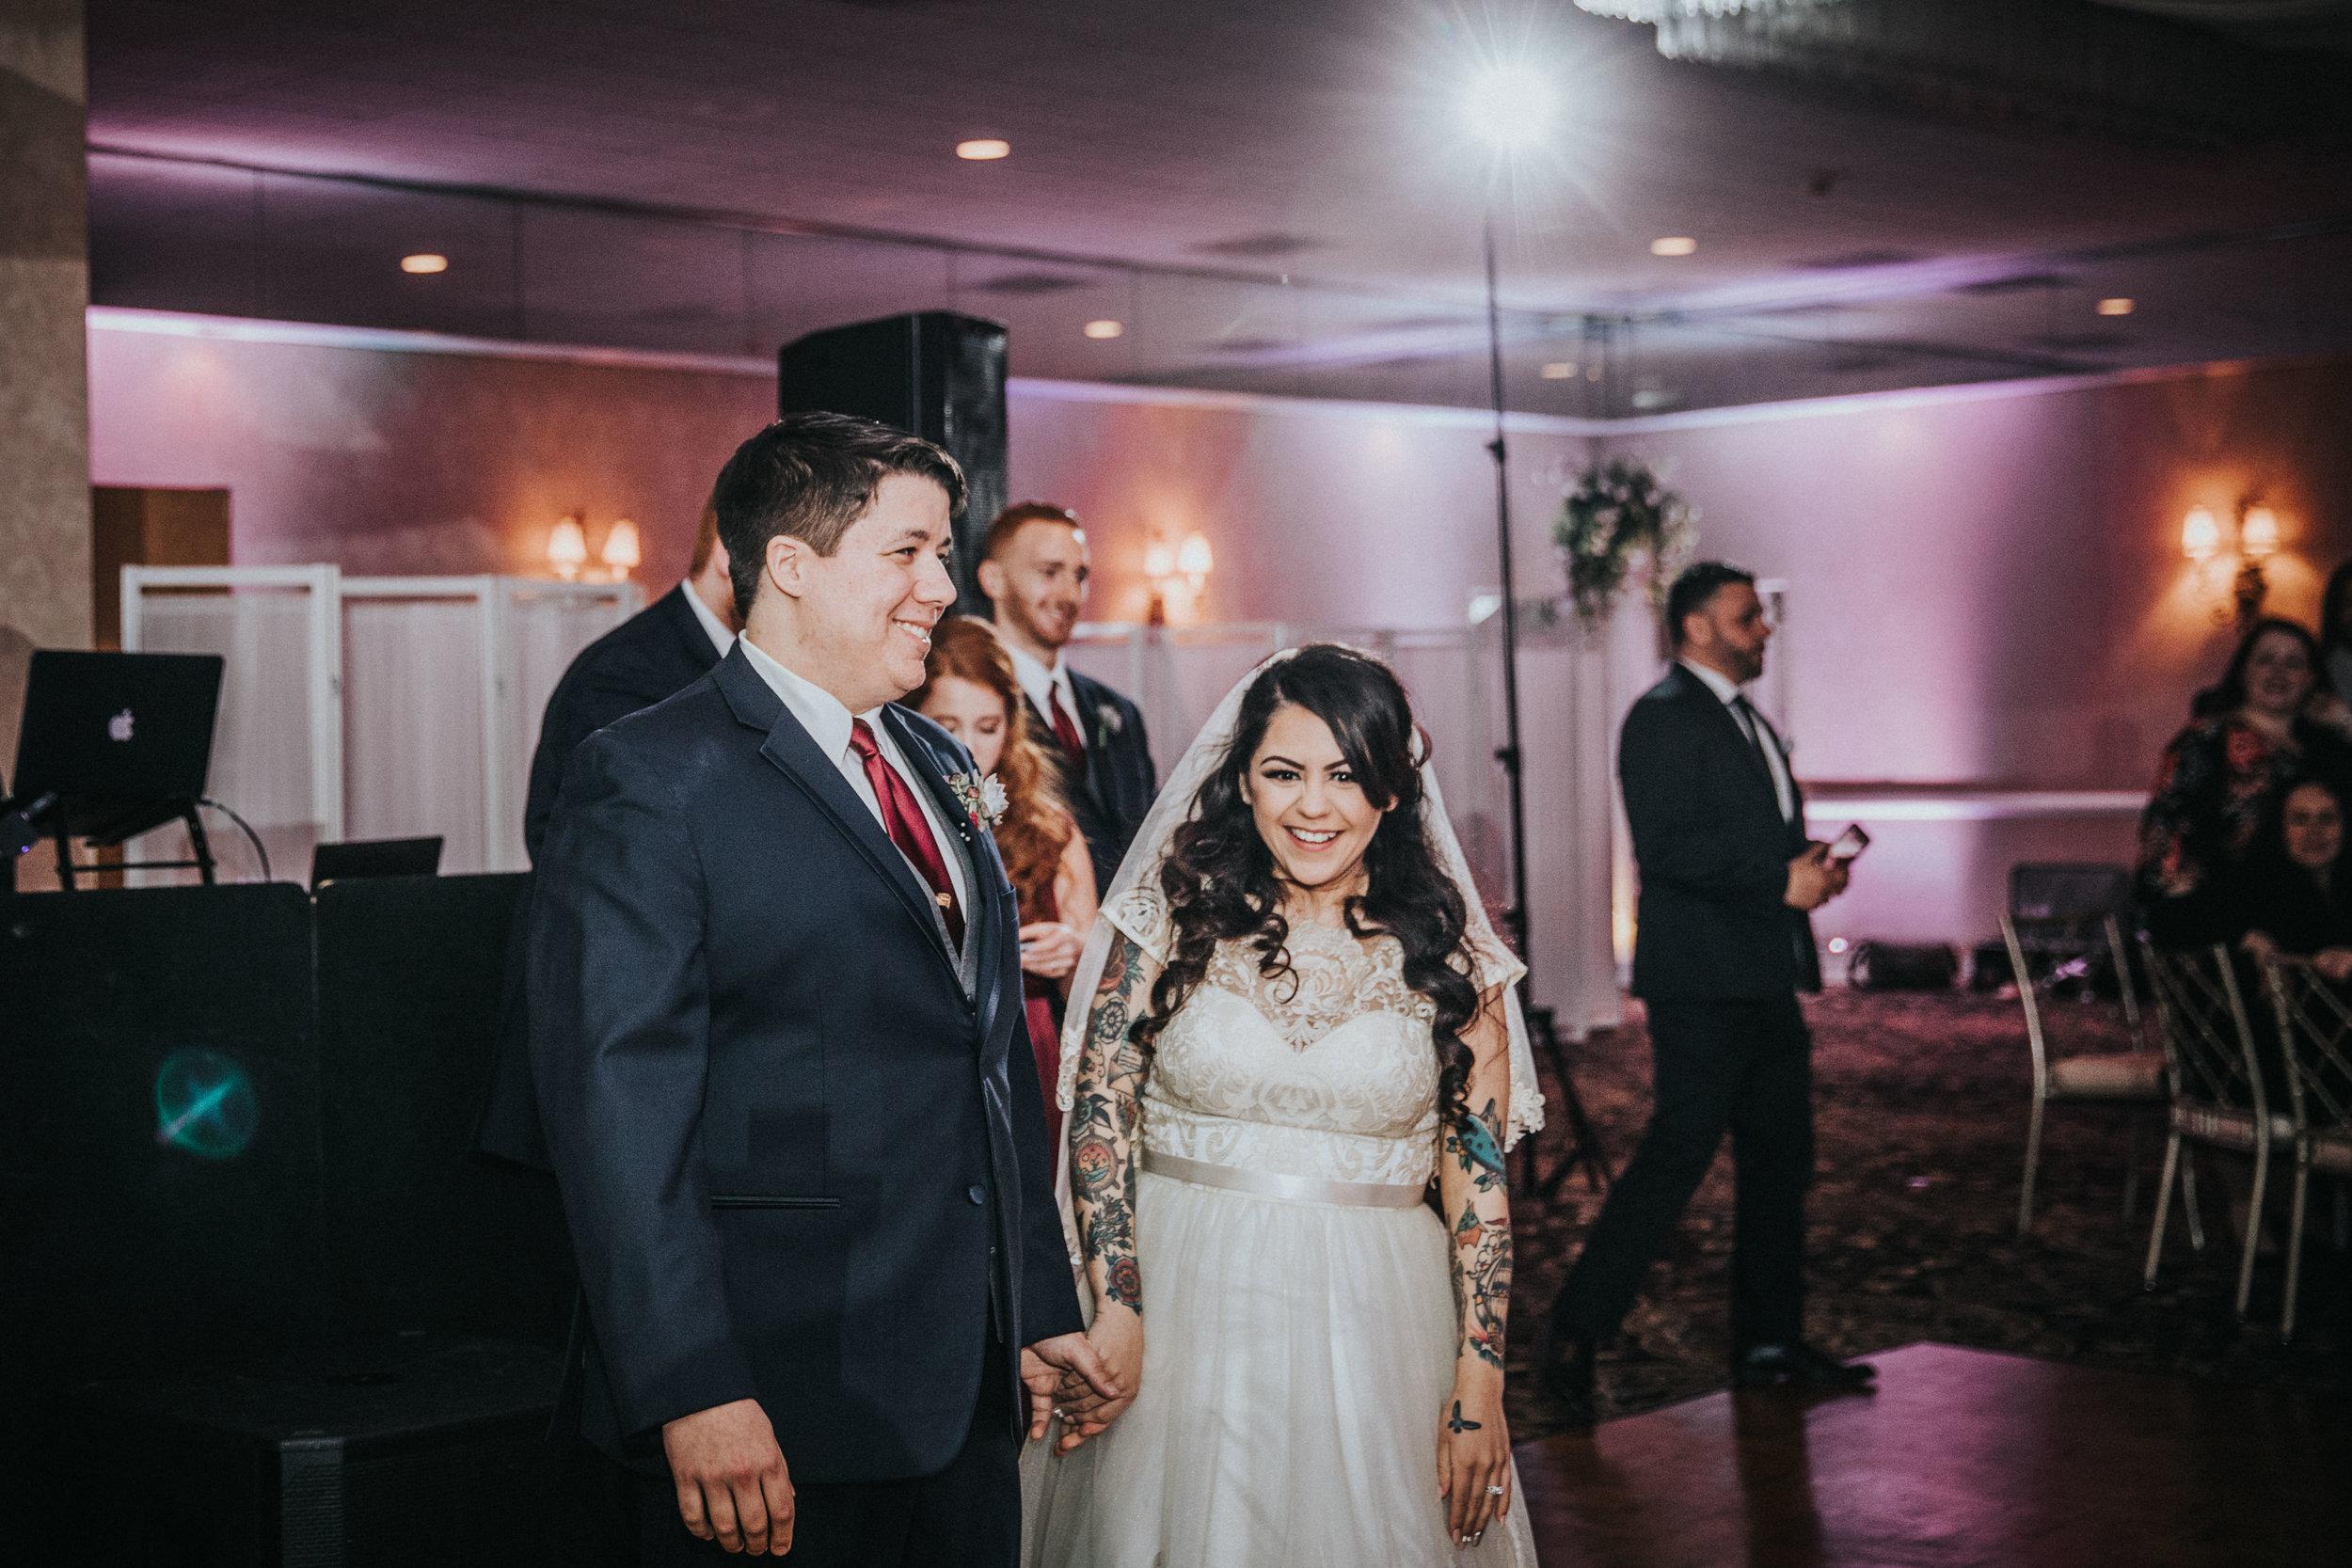 New-Jersey-Wedding-Photographer-ReceptionCenter-Valeria&Mike-Reception (69 of 265).jpg